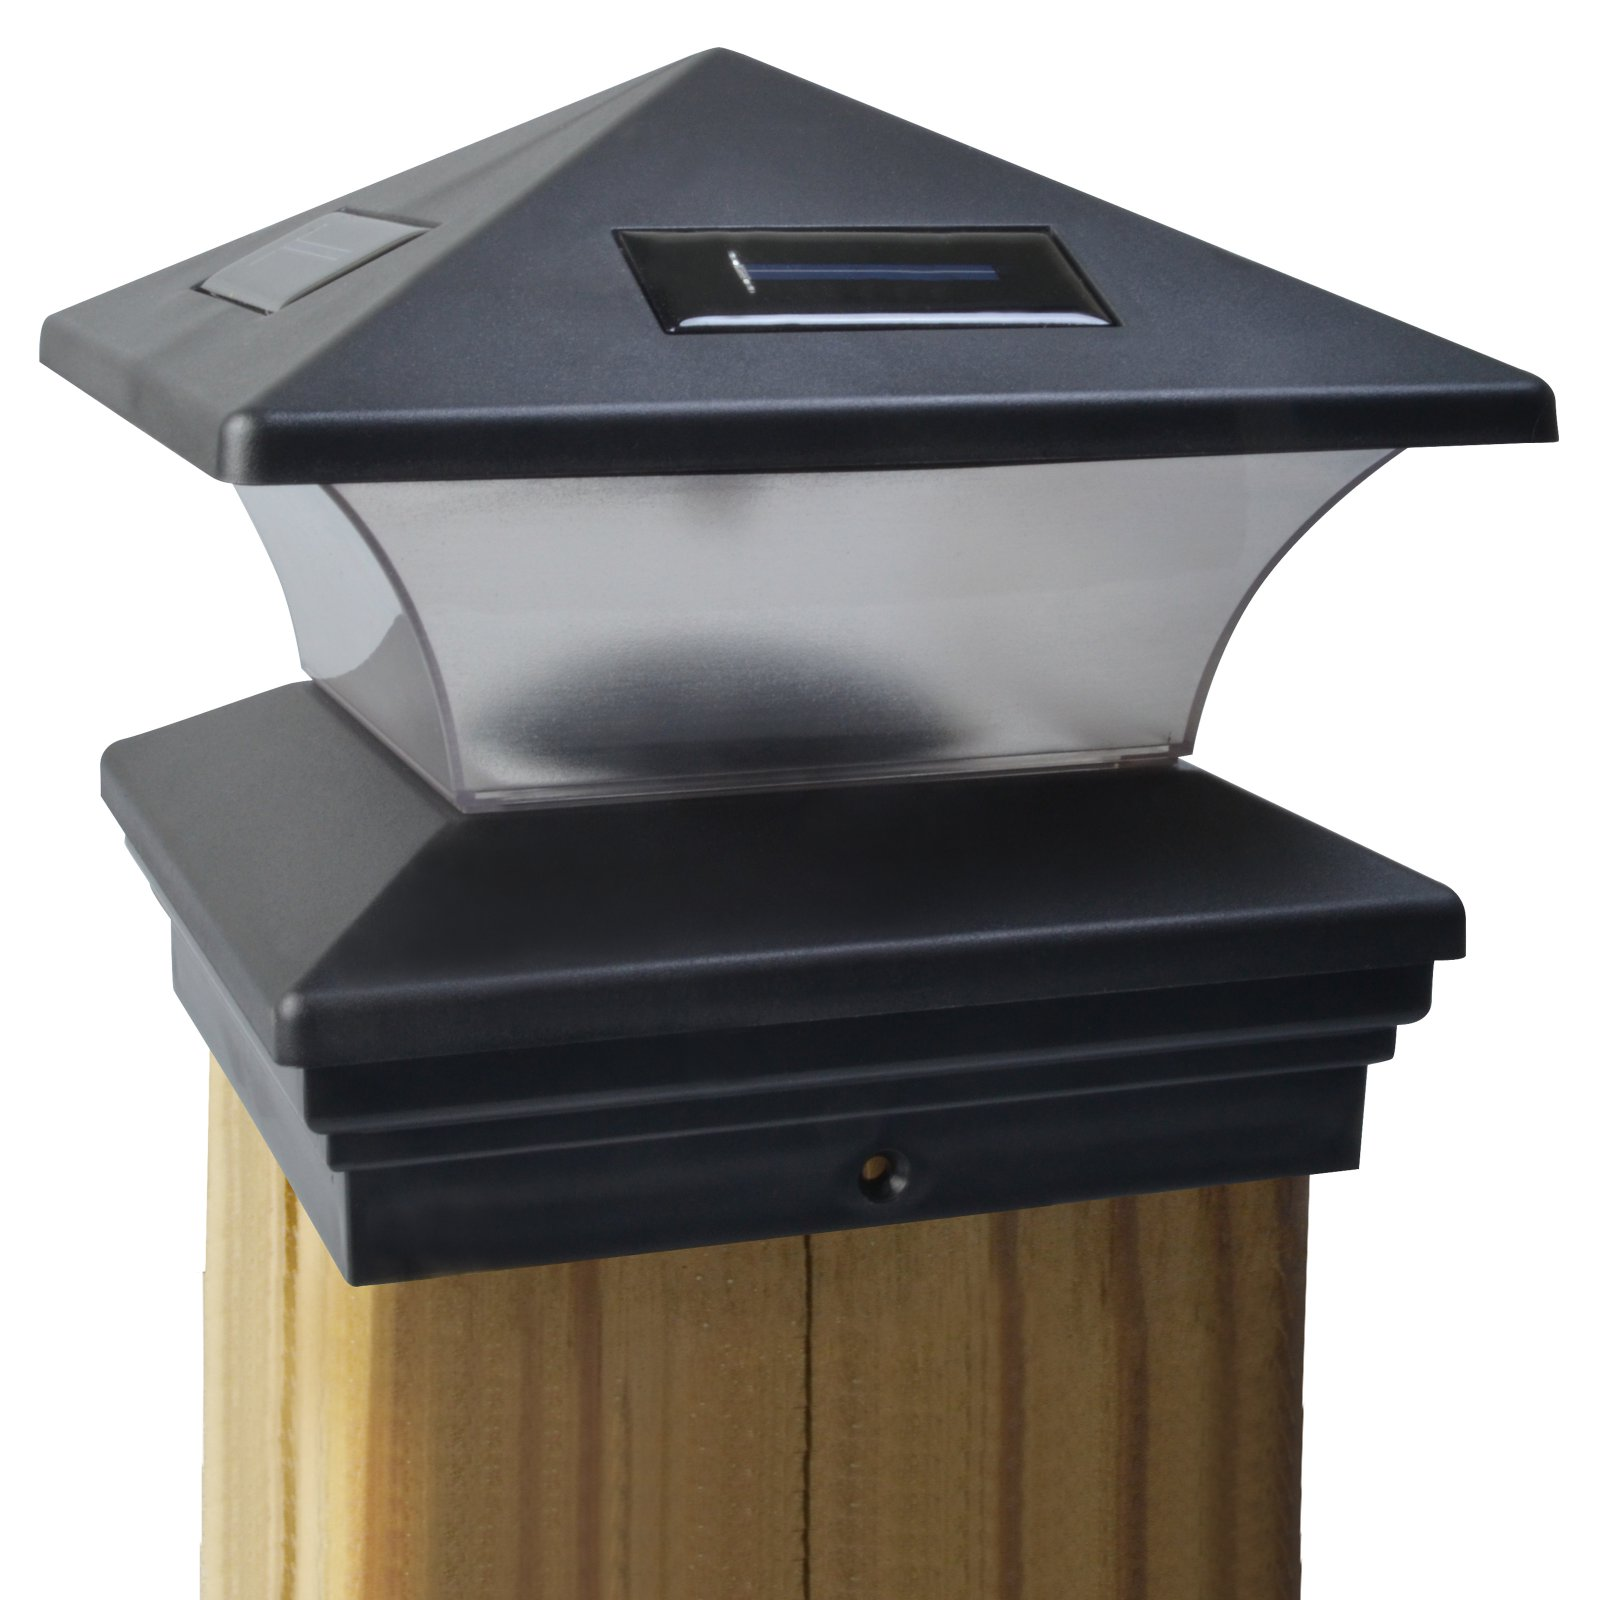 Moonrays 91268 Solar Powered LED Post Cap Light, 6-Inch by 6-Inch Post, Black Finish